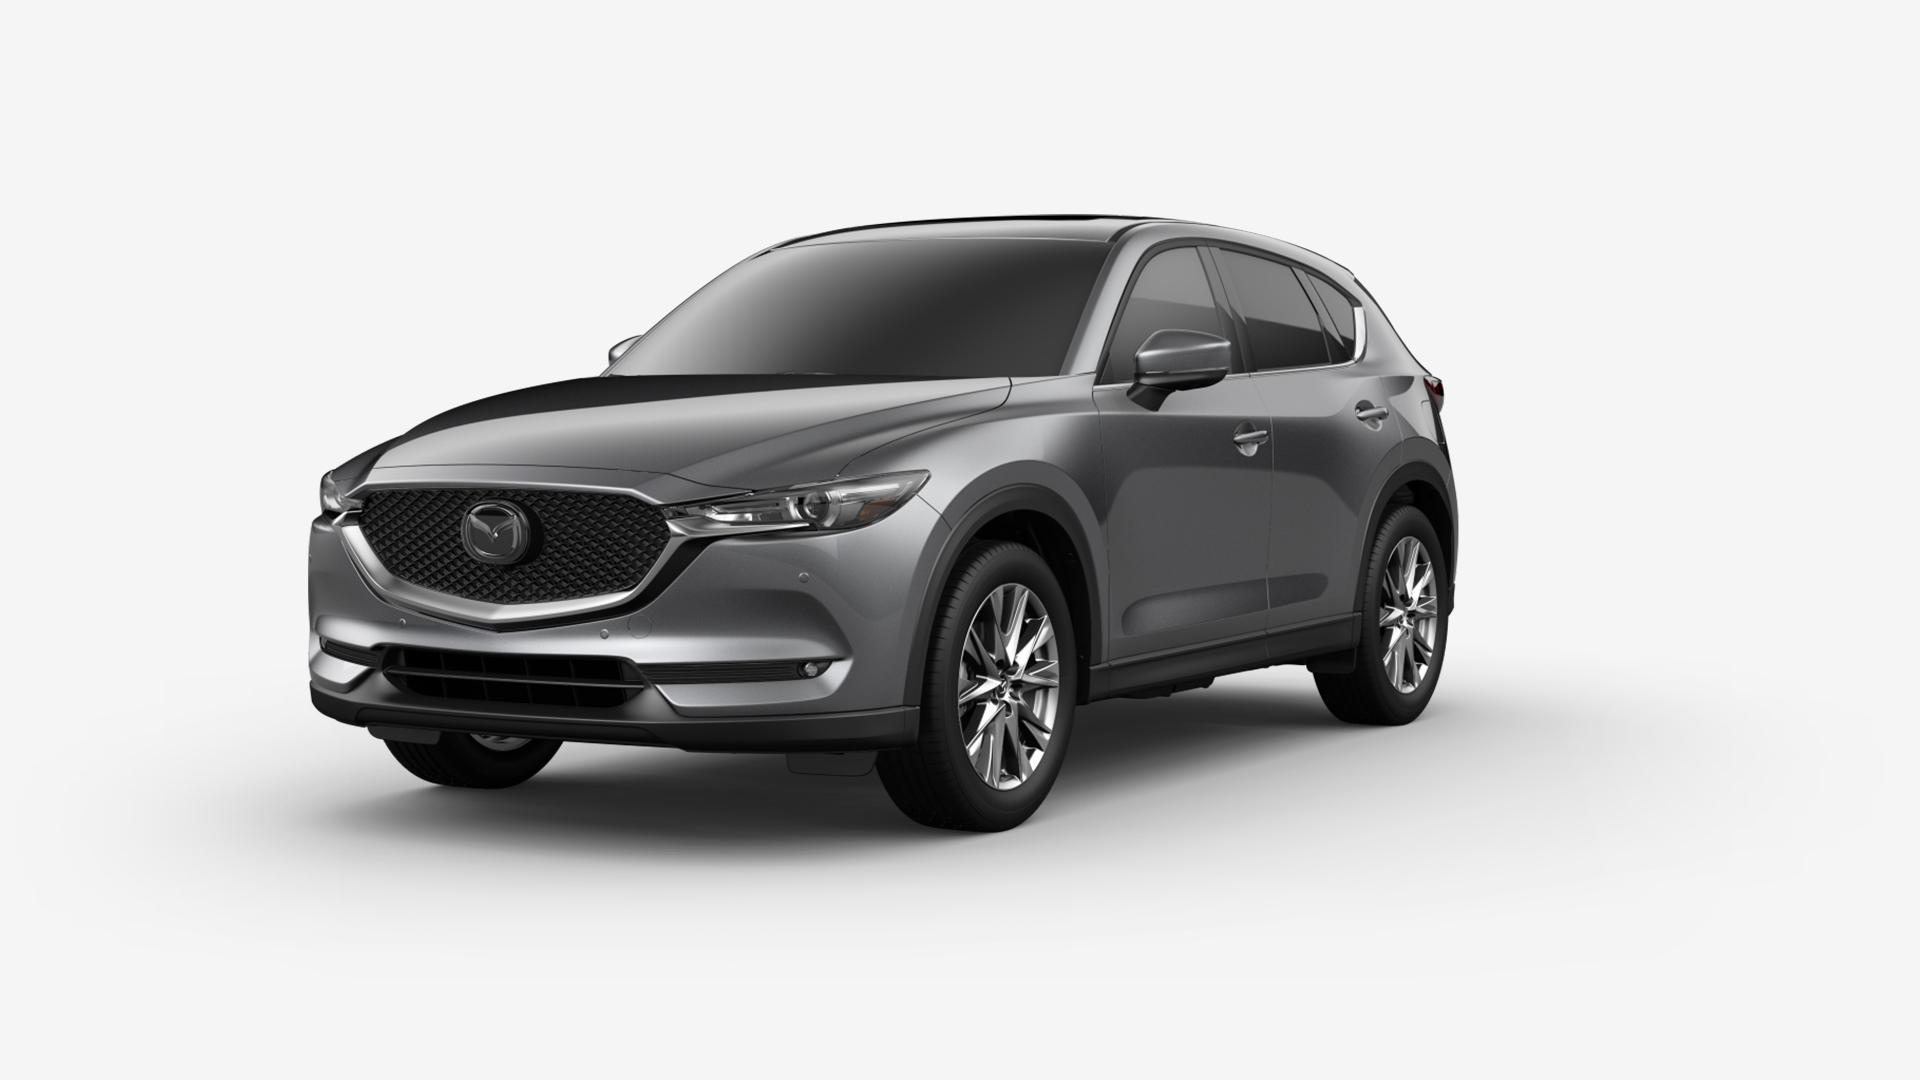 Kekurangan Mazda Suv Cx 5 Perbandingan Harga